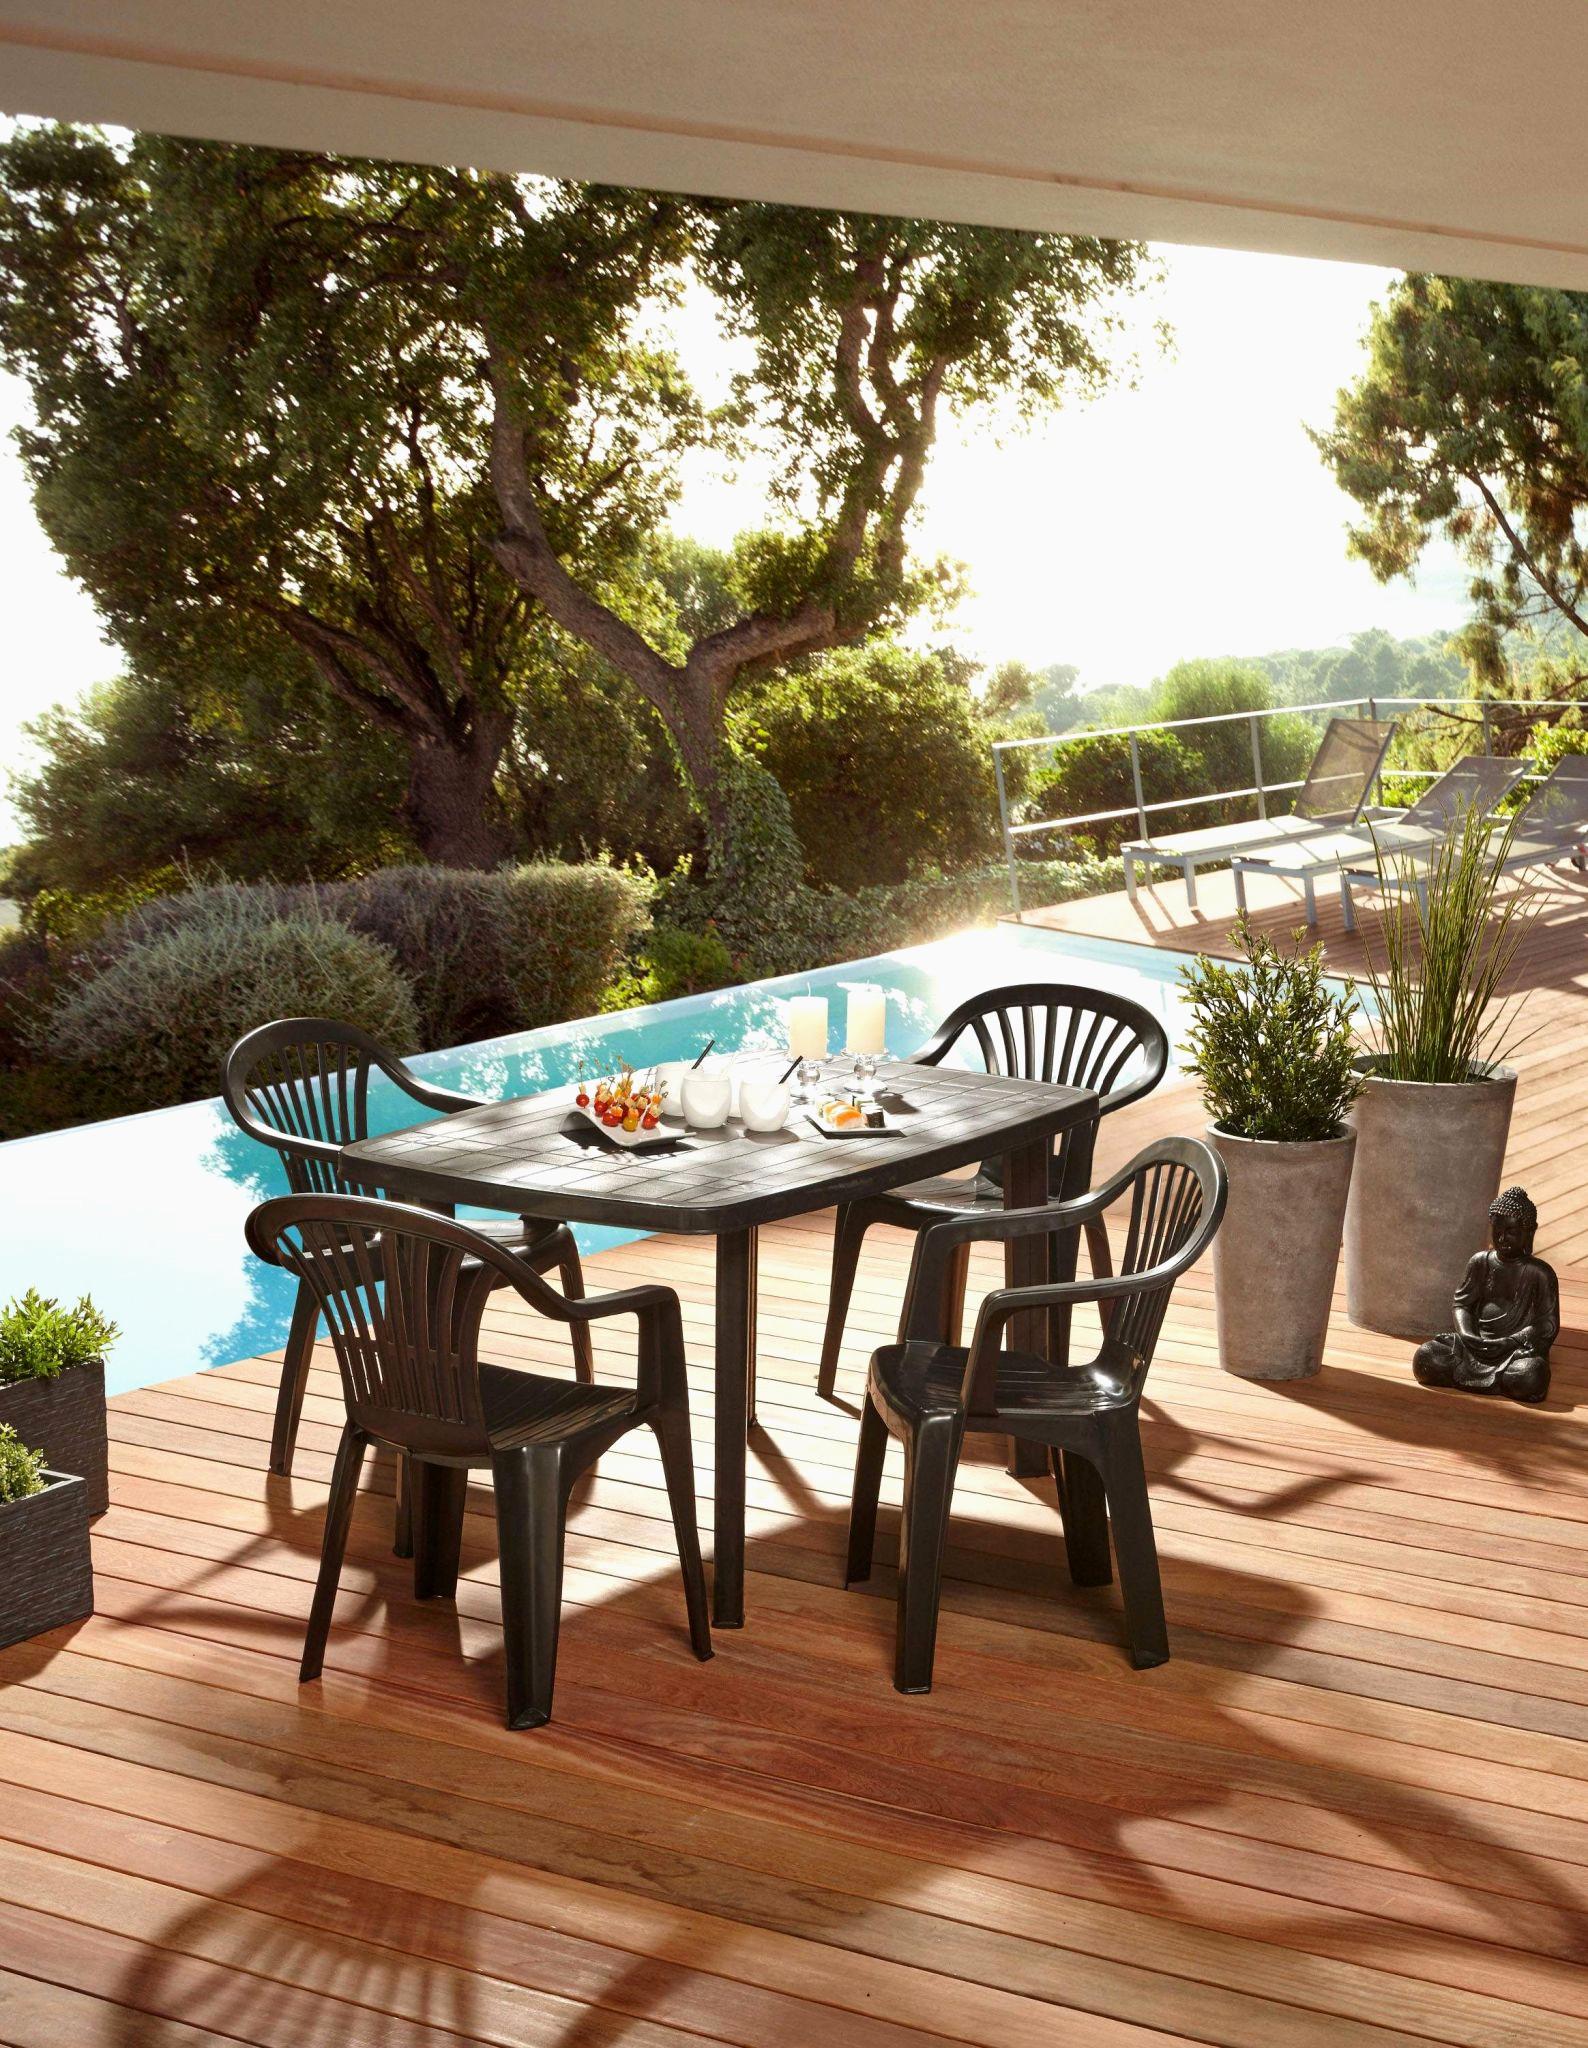 Salon De Jardin Pas Cher Amazone Surprenant Amazon Salon De ... concernant Salon De Jardin Pas Cher Amazon